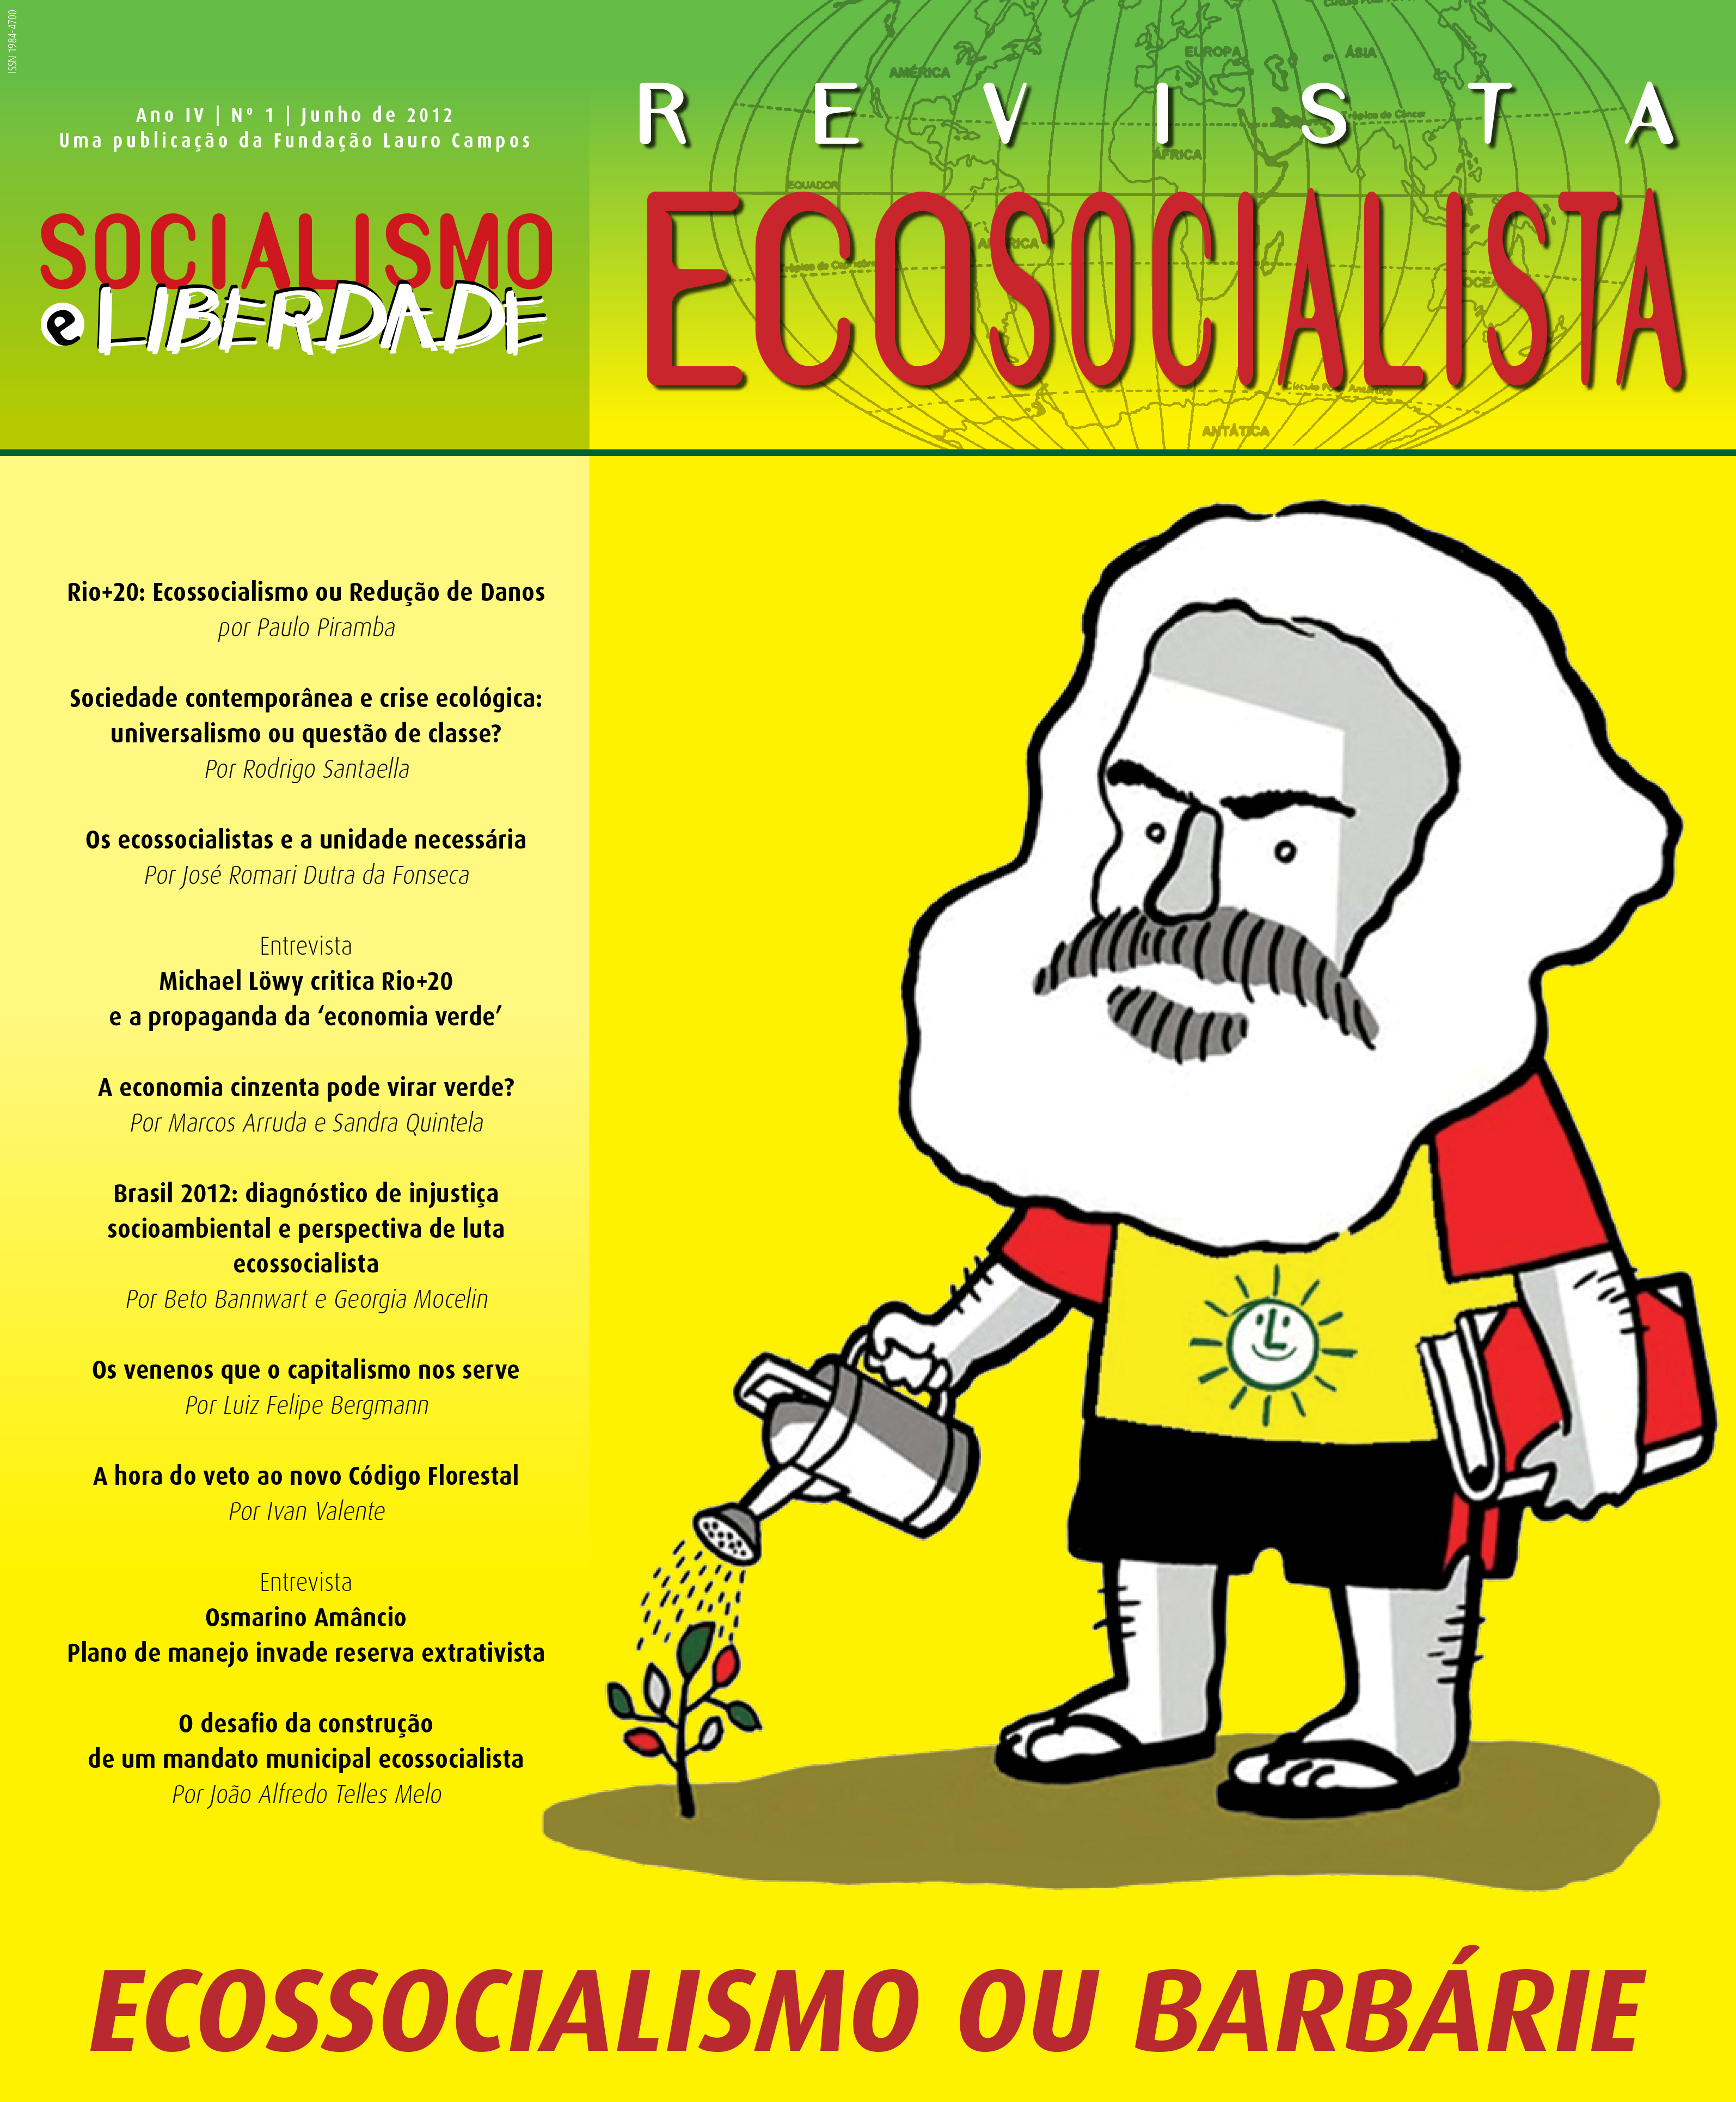 revista-ecossocialista-1